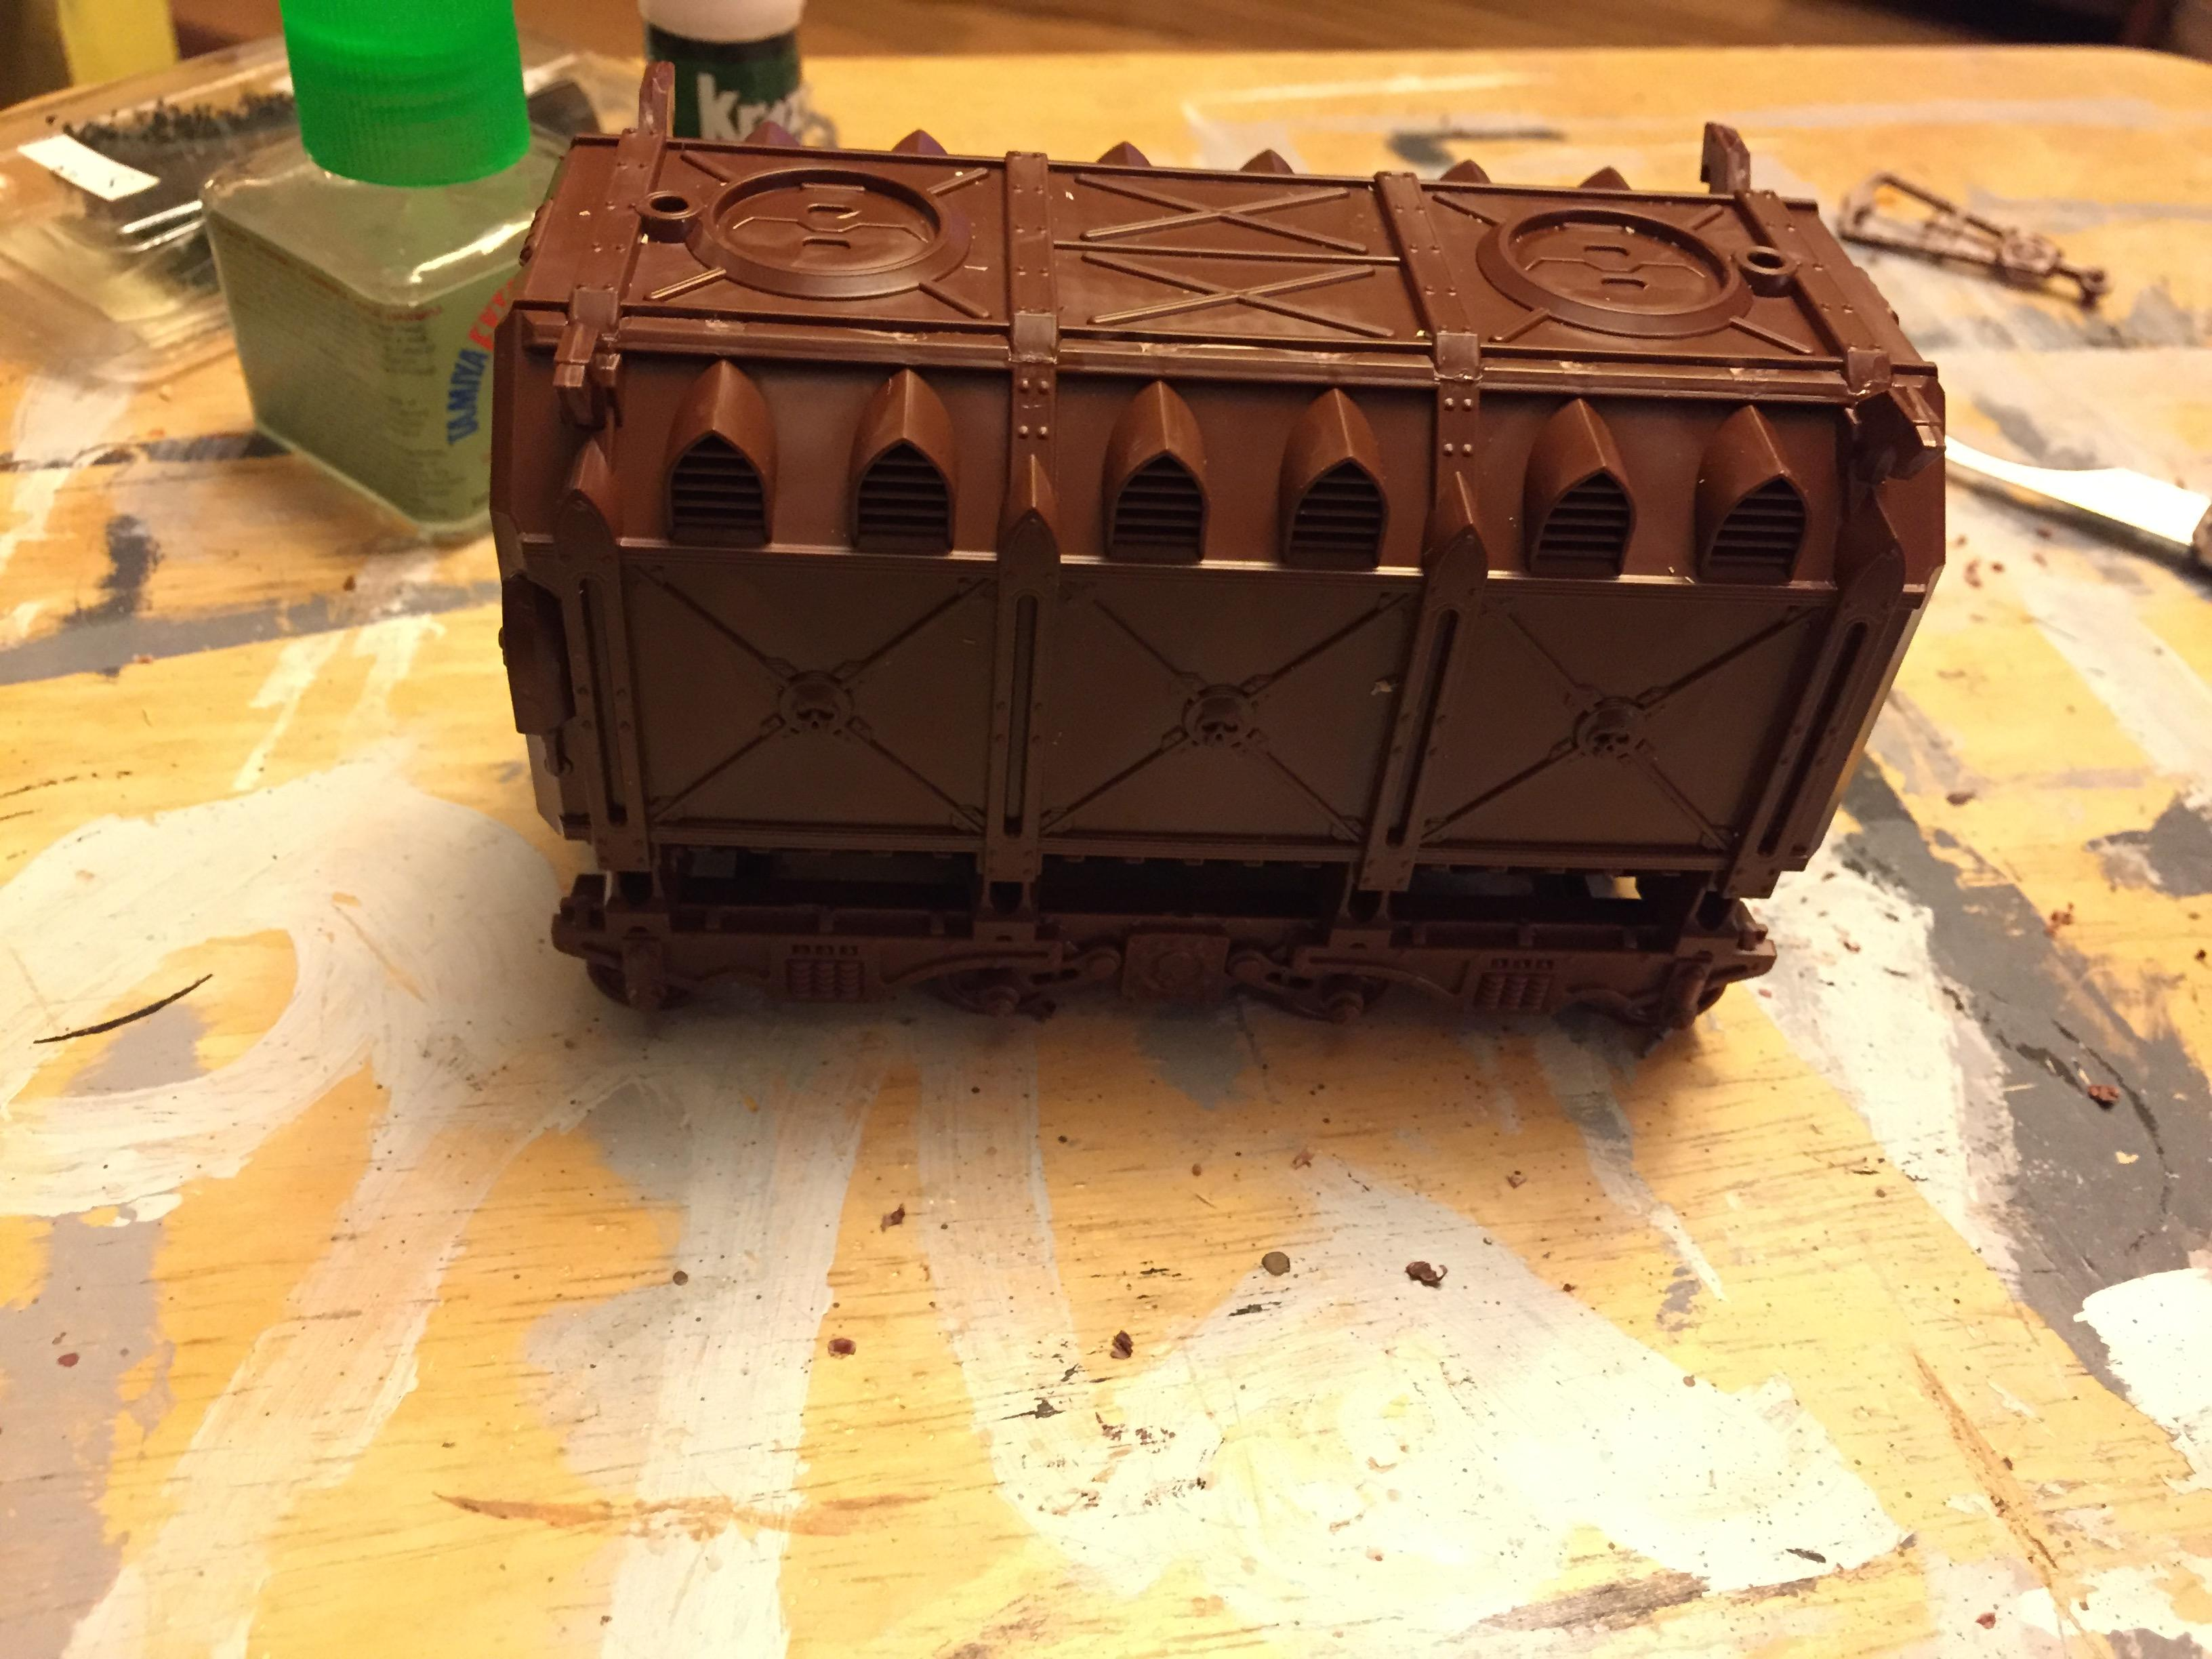 Container, Crate, Terrain, Warhammer 40,000, Work In Progress